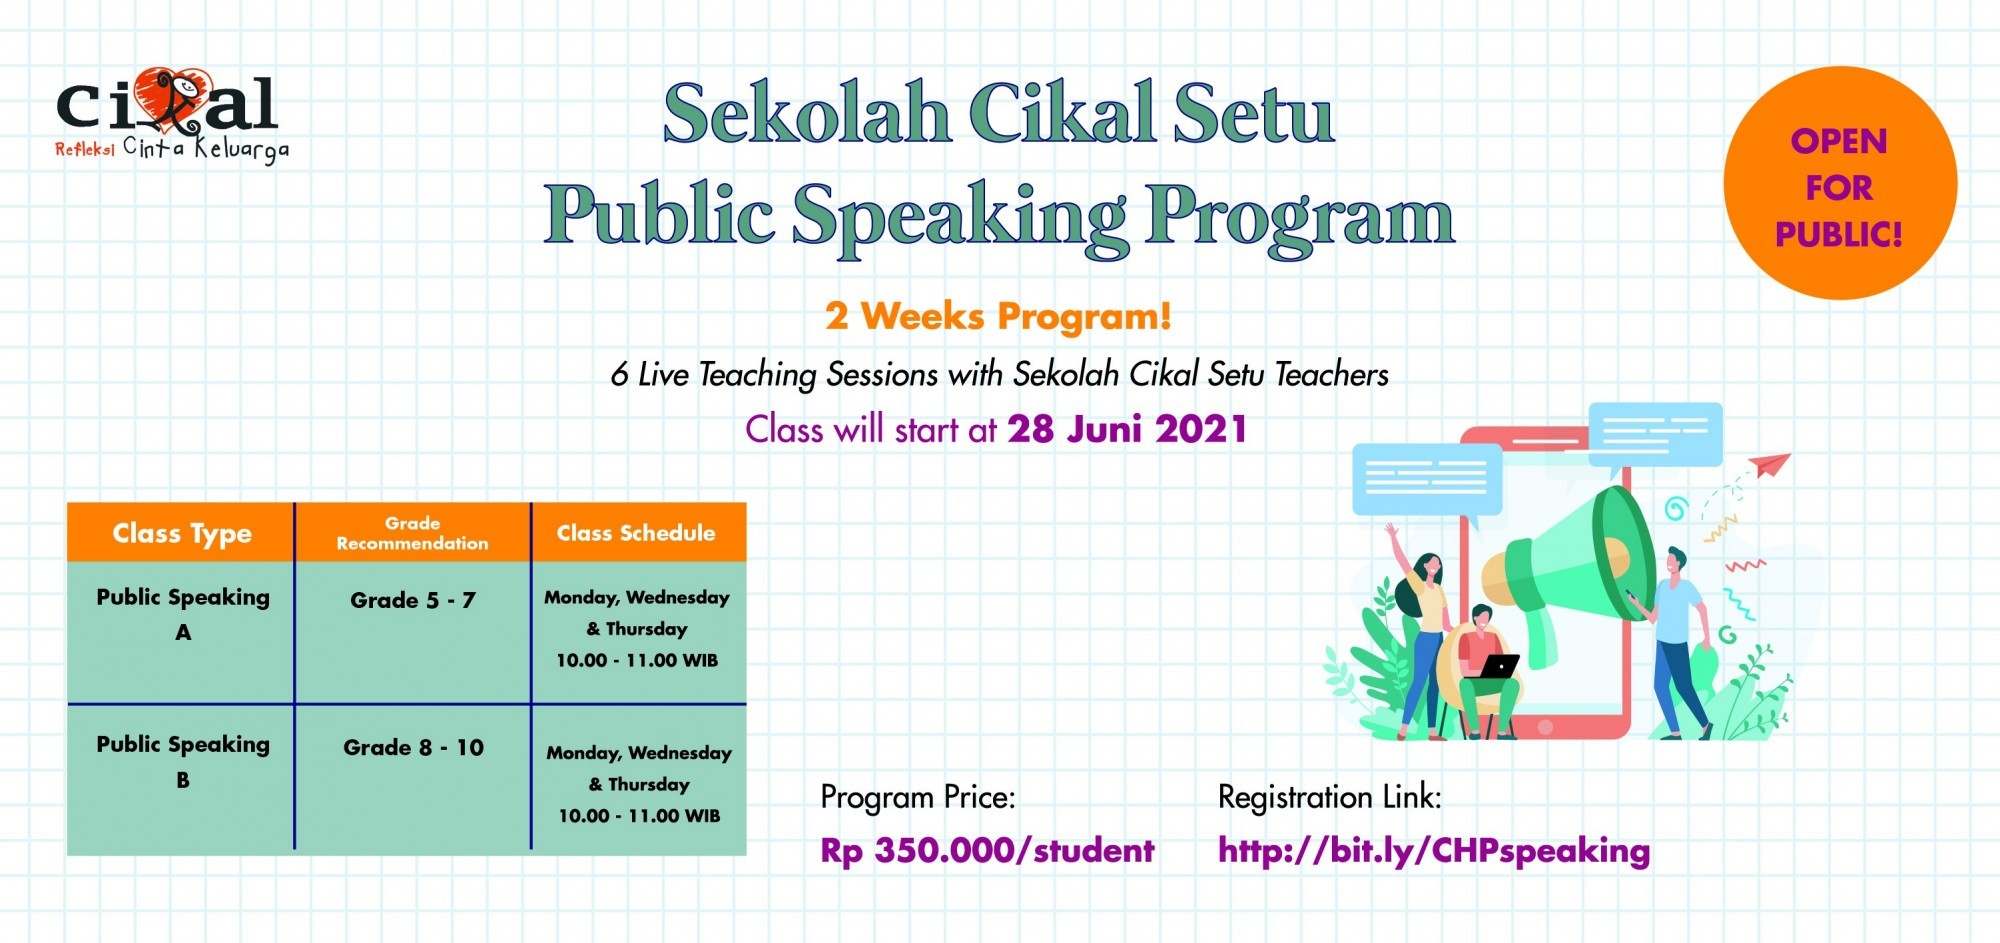 Cikal Holiday Program: Public Speaking